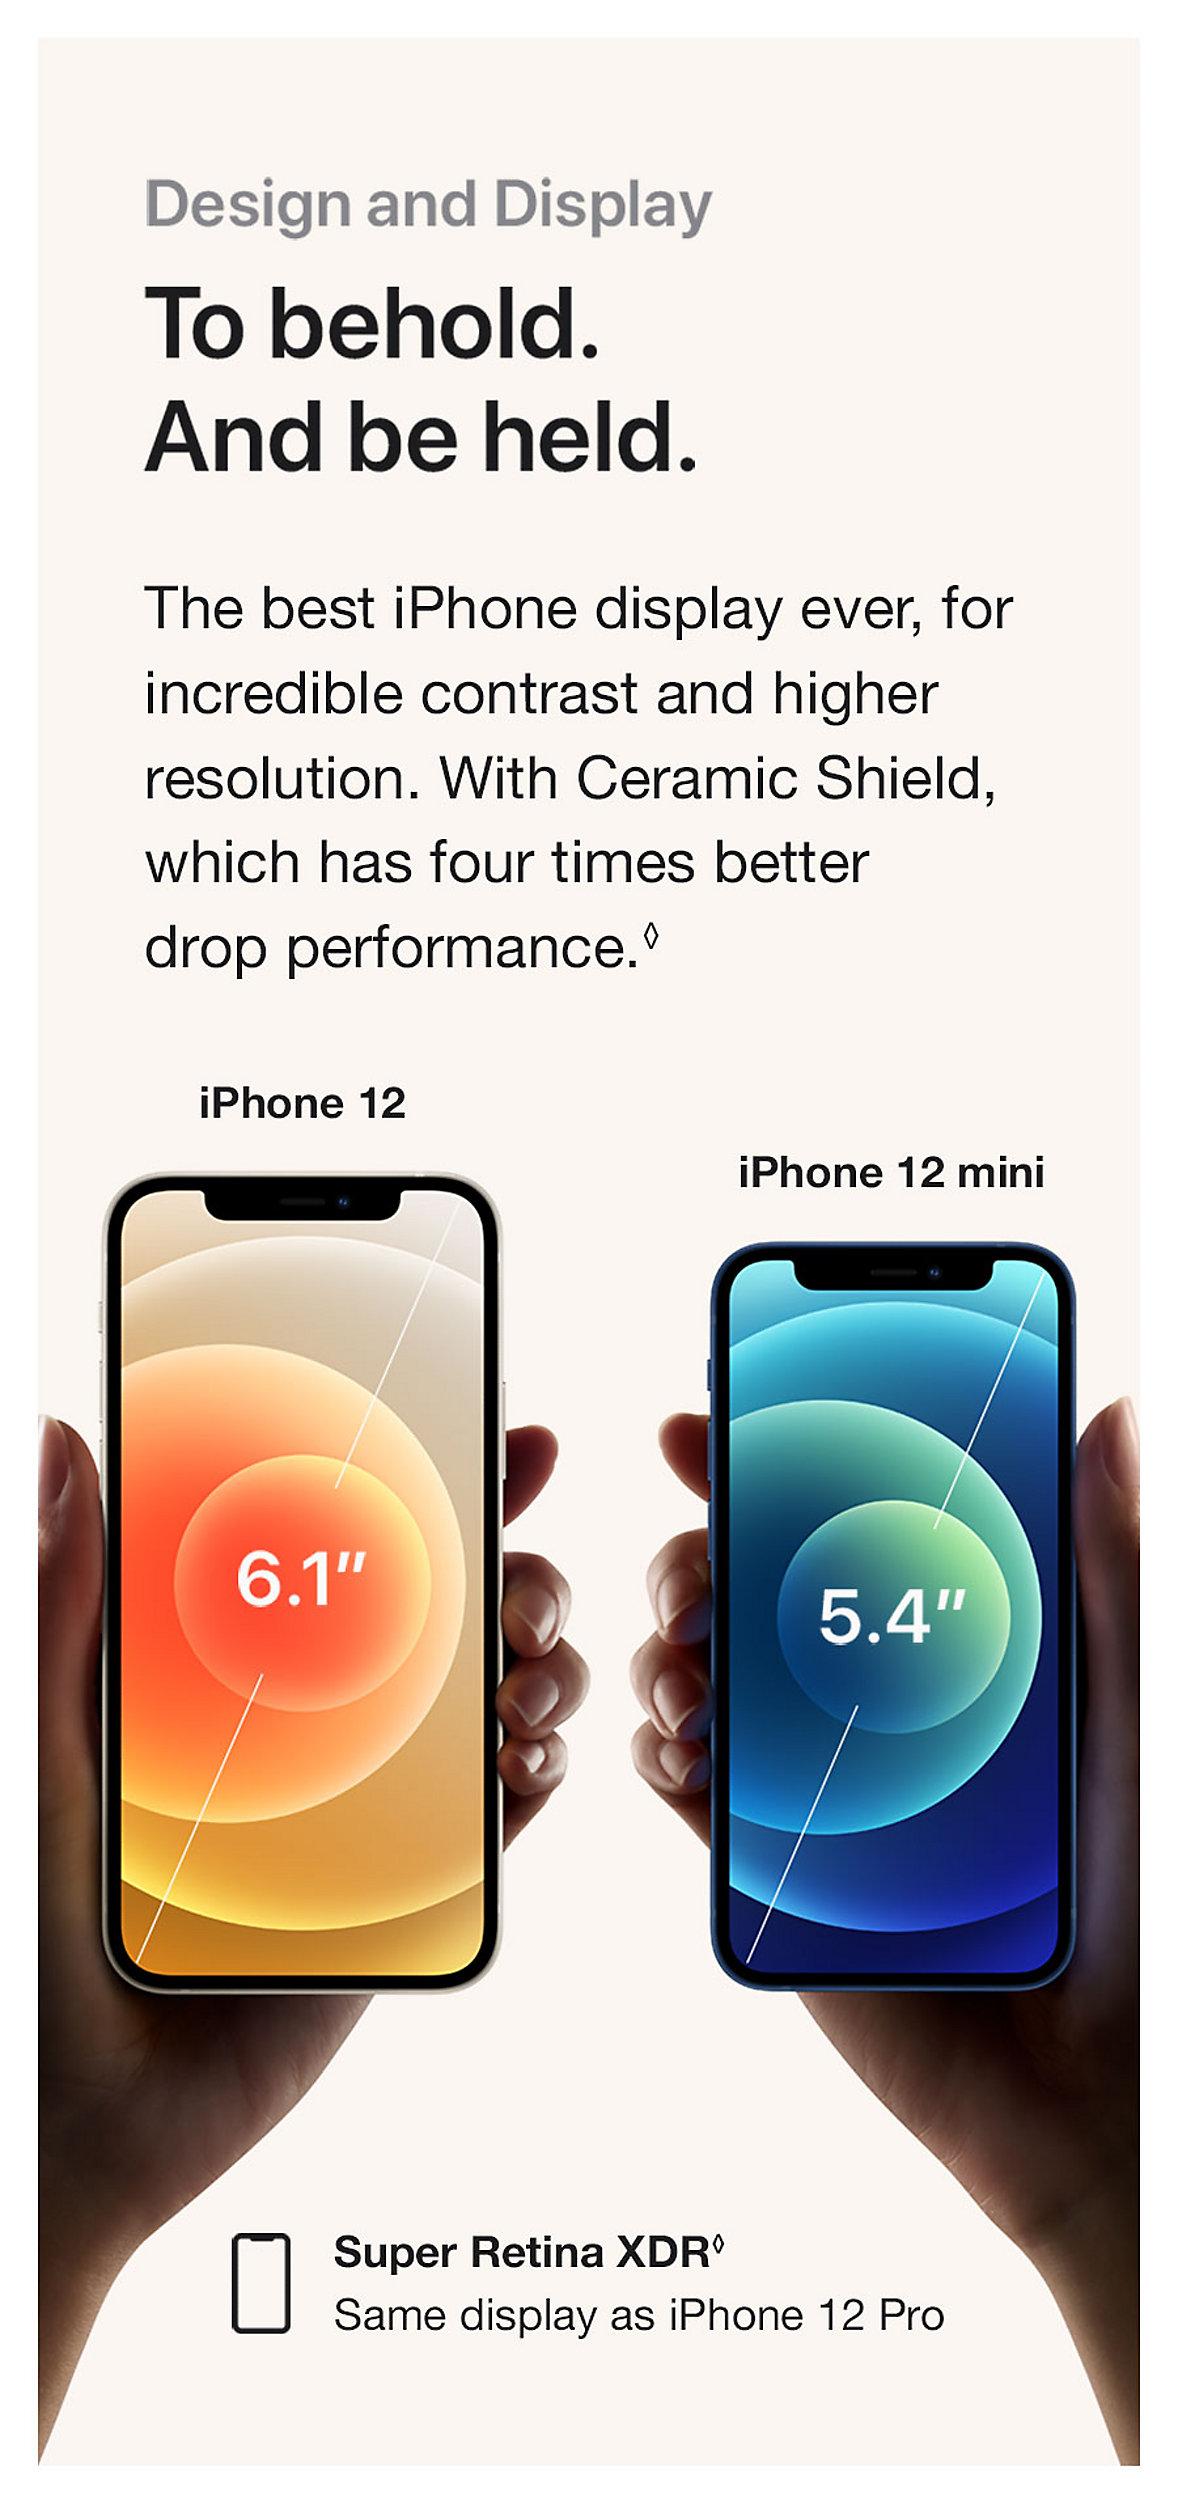 Apple iPhone 12 Super Retina XDR Design and Display